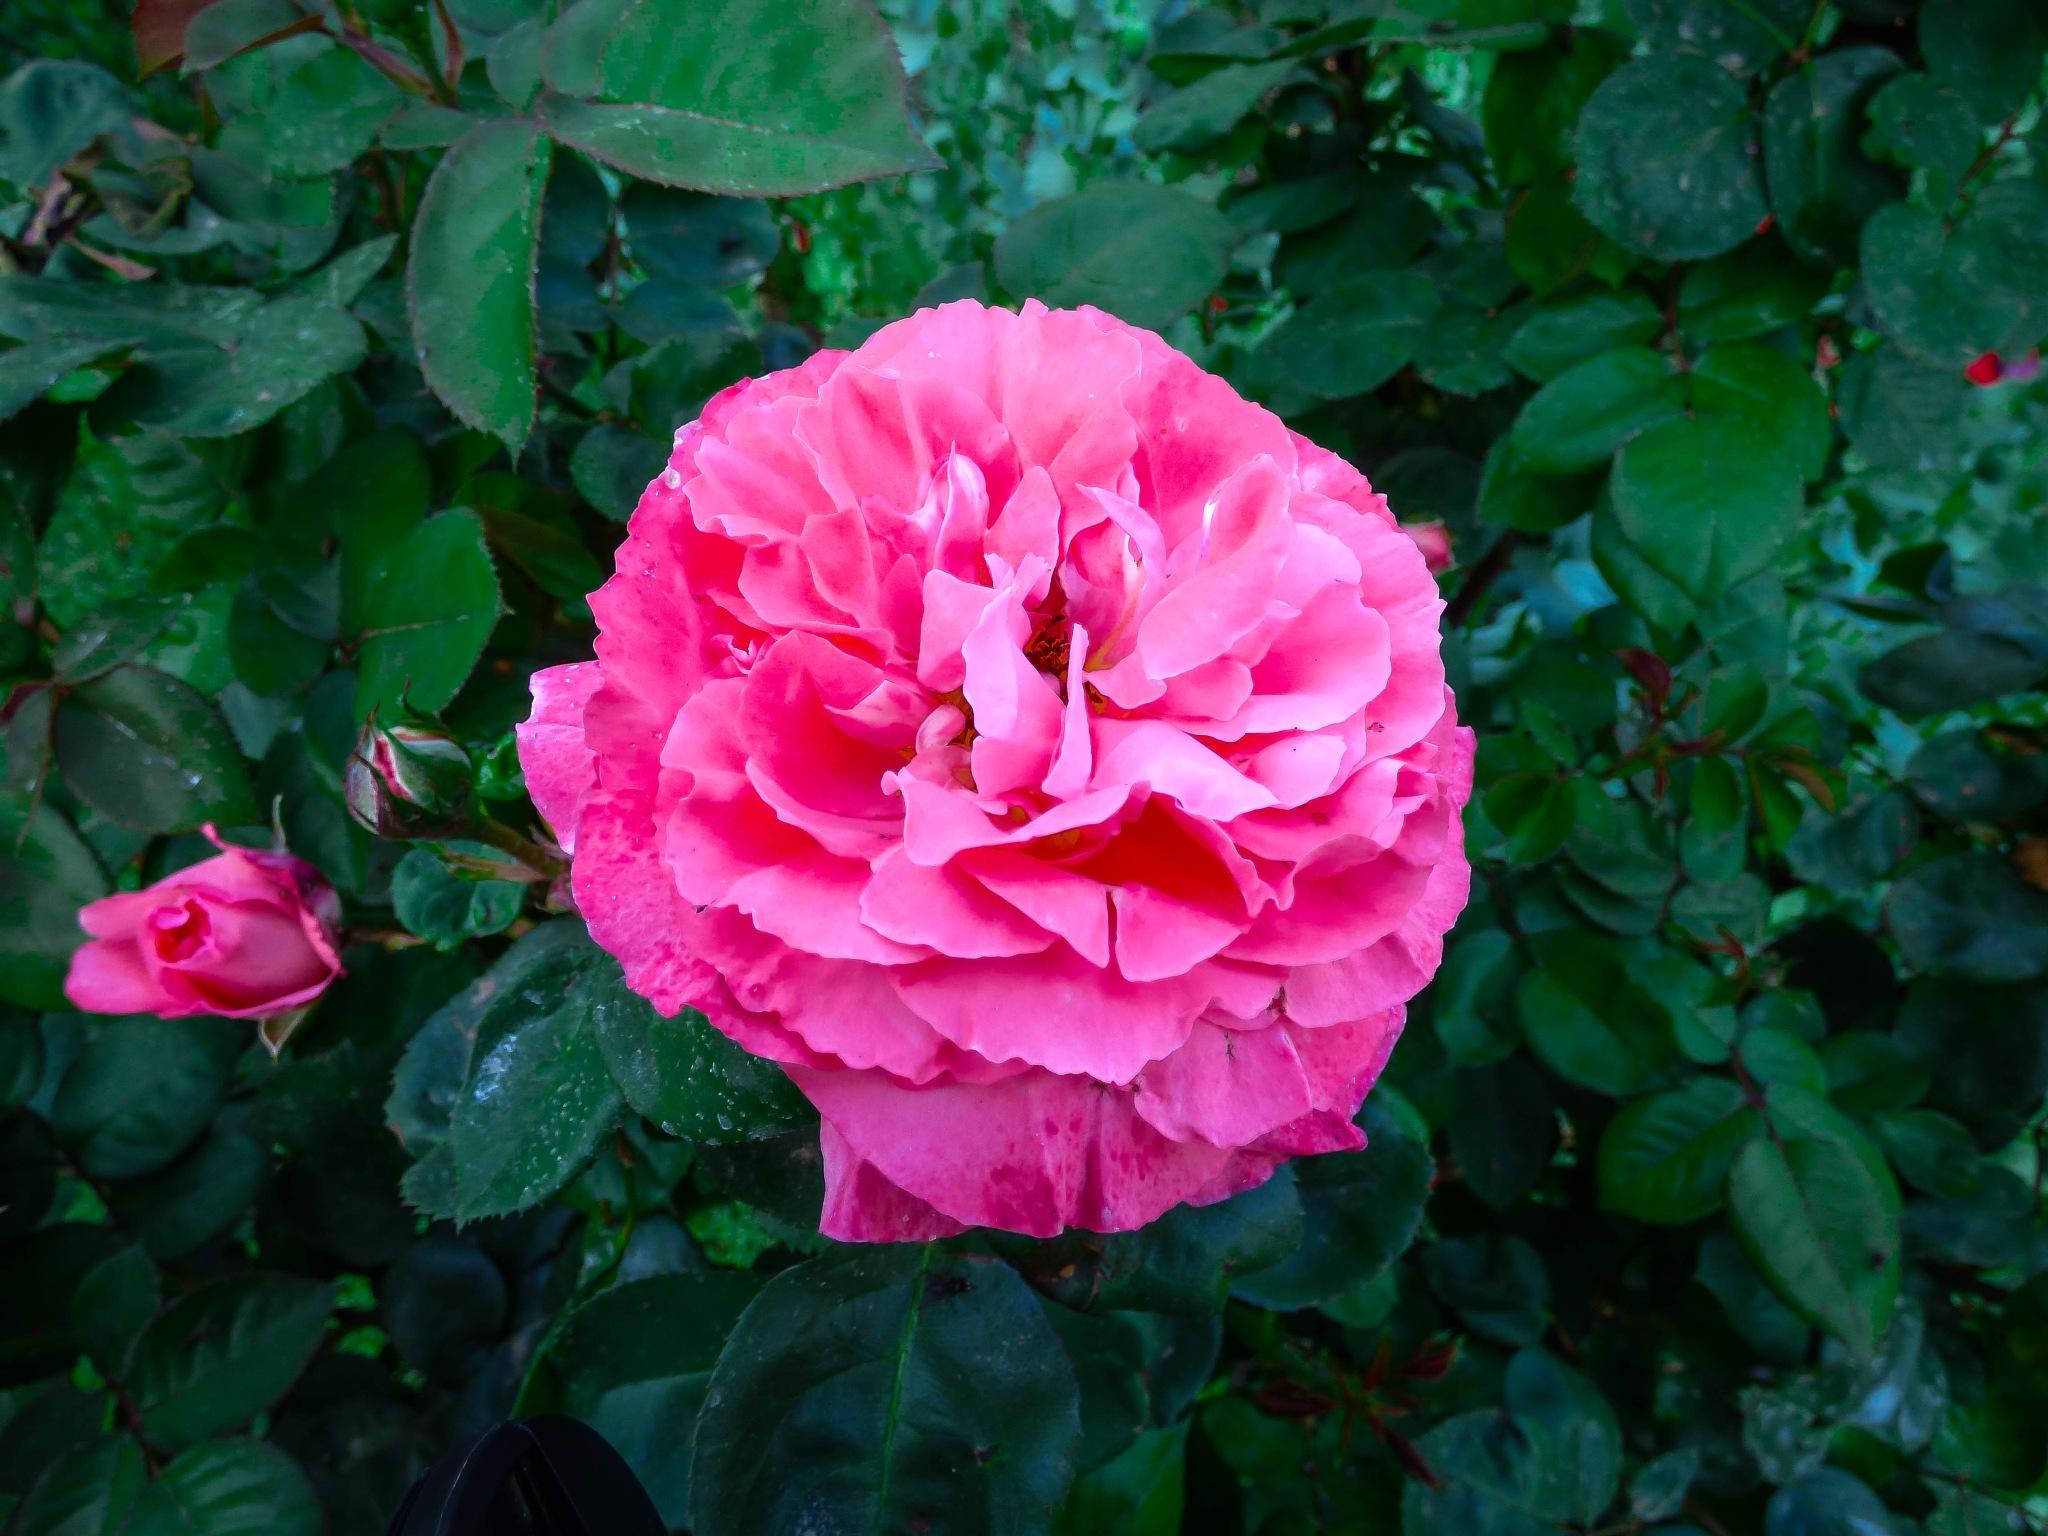 Rose by Roberto Justo Robiolo